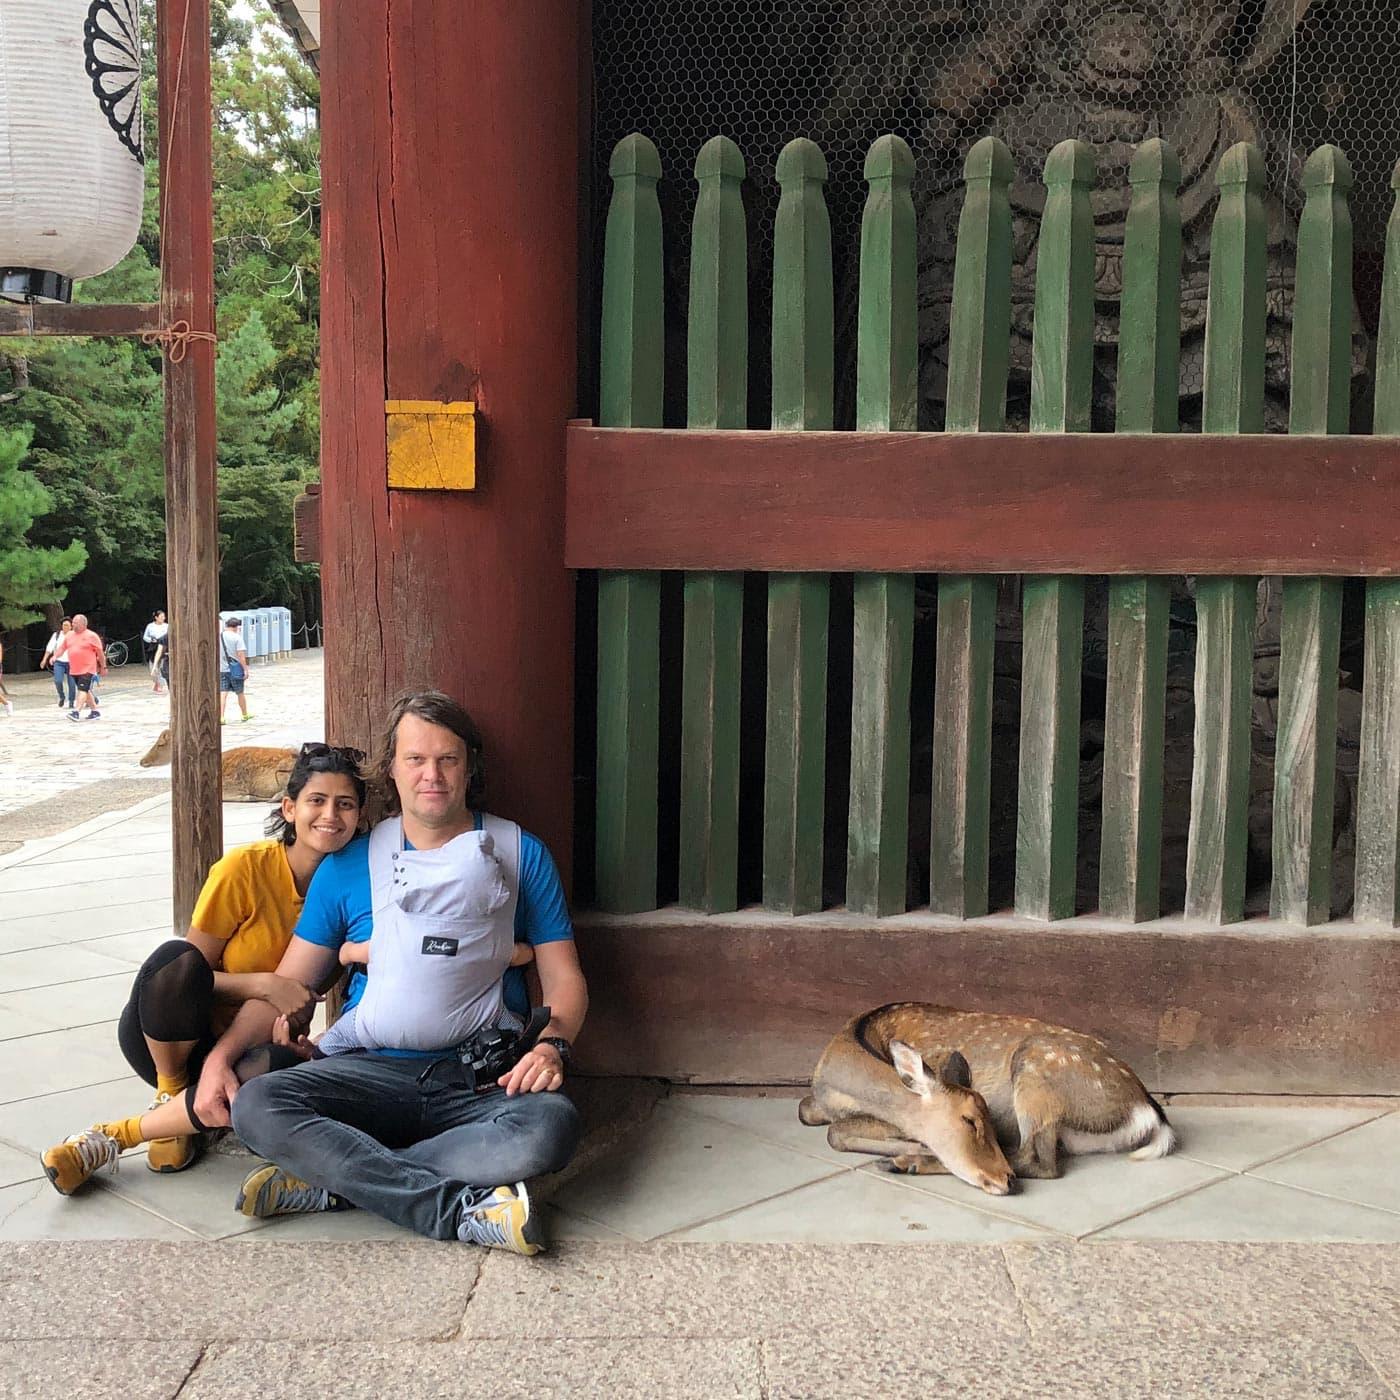 Japan mit Baby: Familie mit Reh // HIMBEER